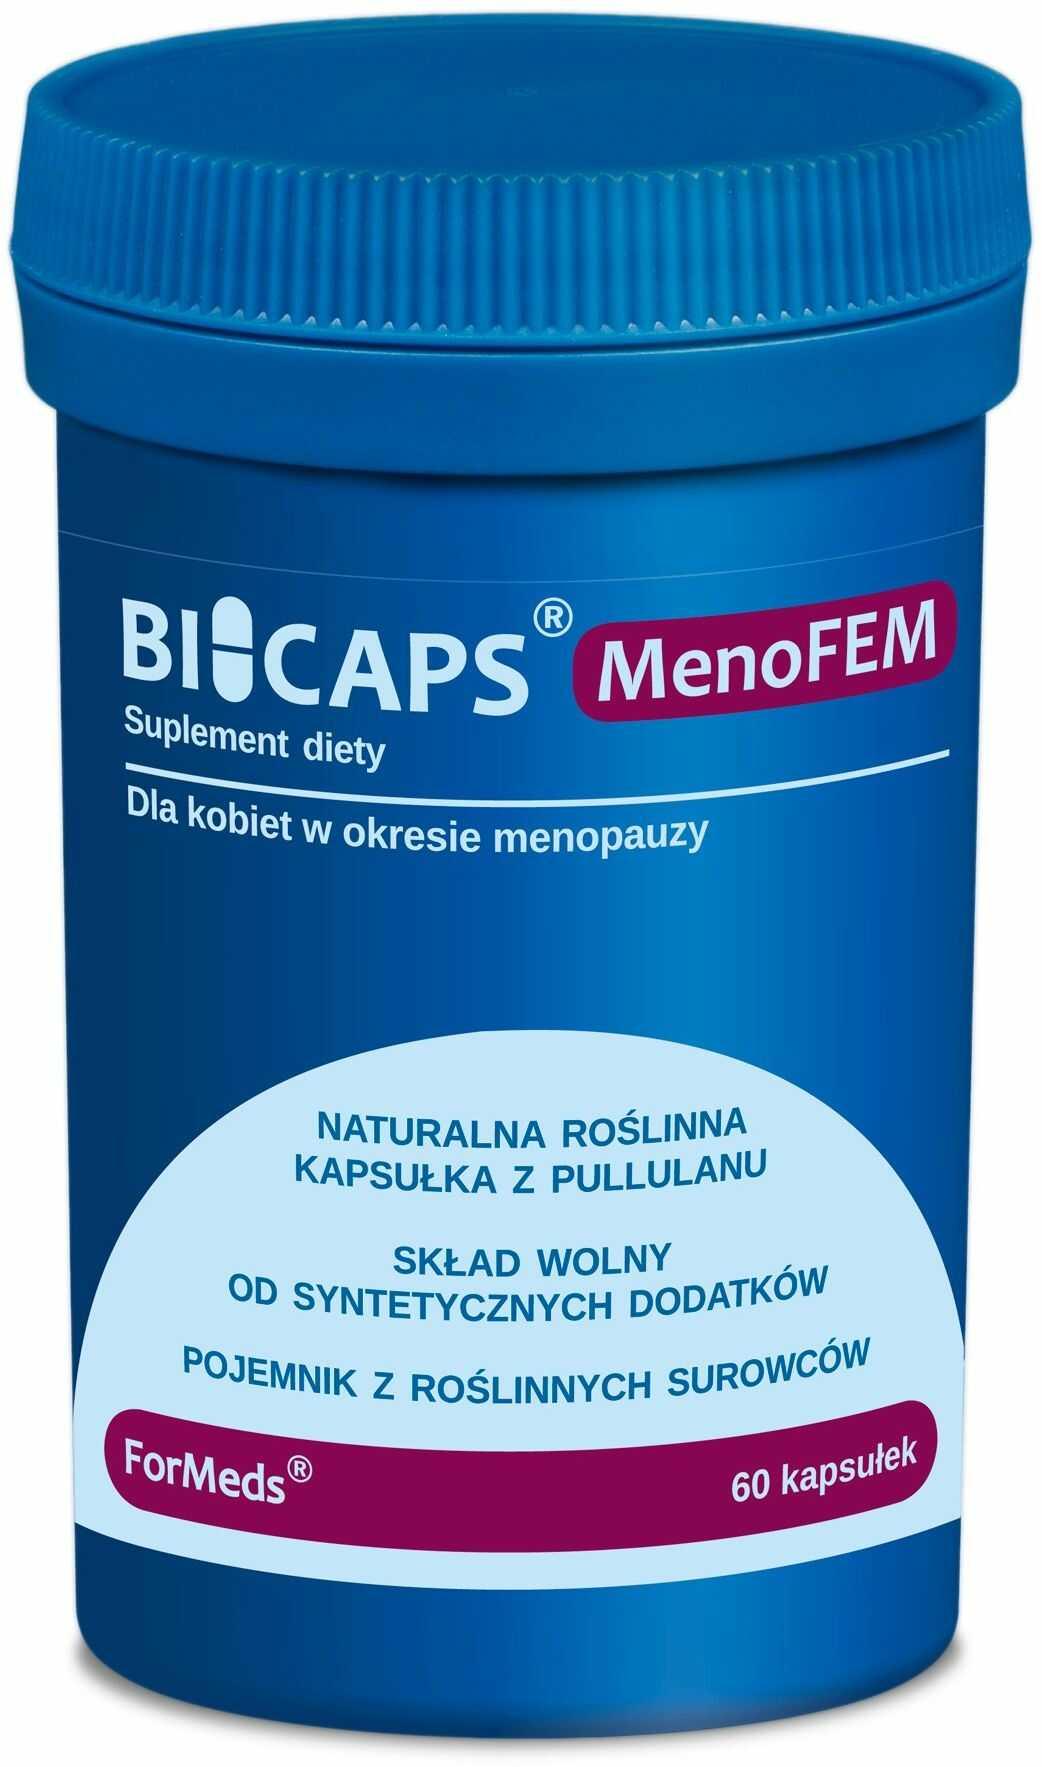 ForMeds Bicaps MenoFEM (Okres menopauzy) 60 Kapsułek